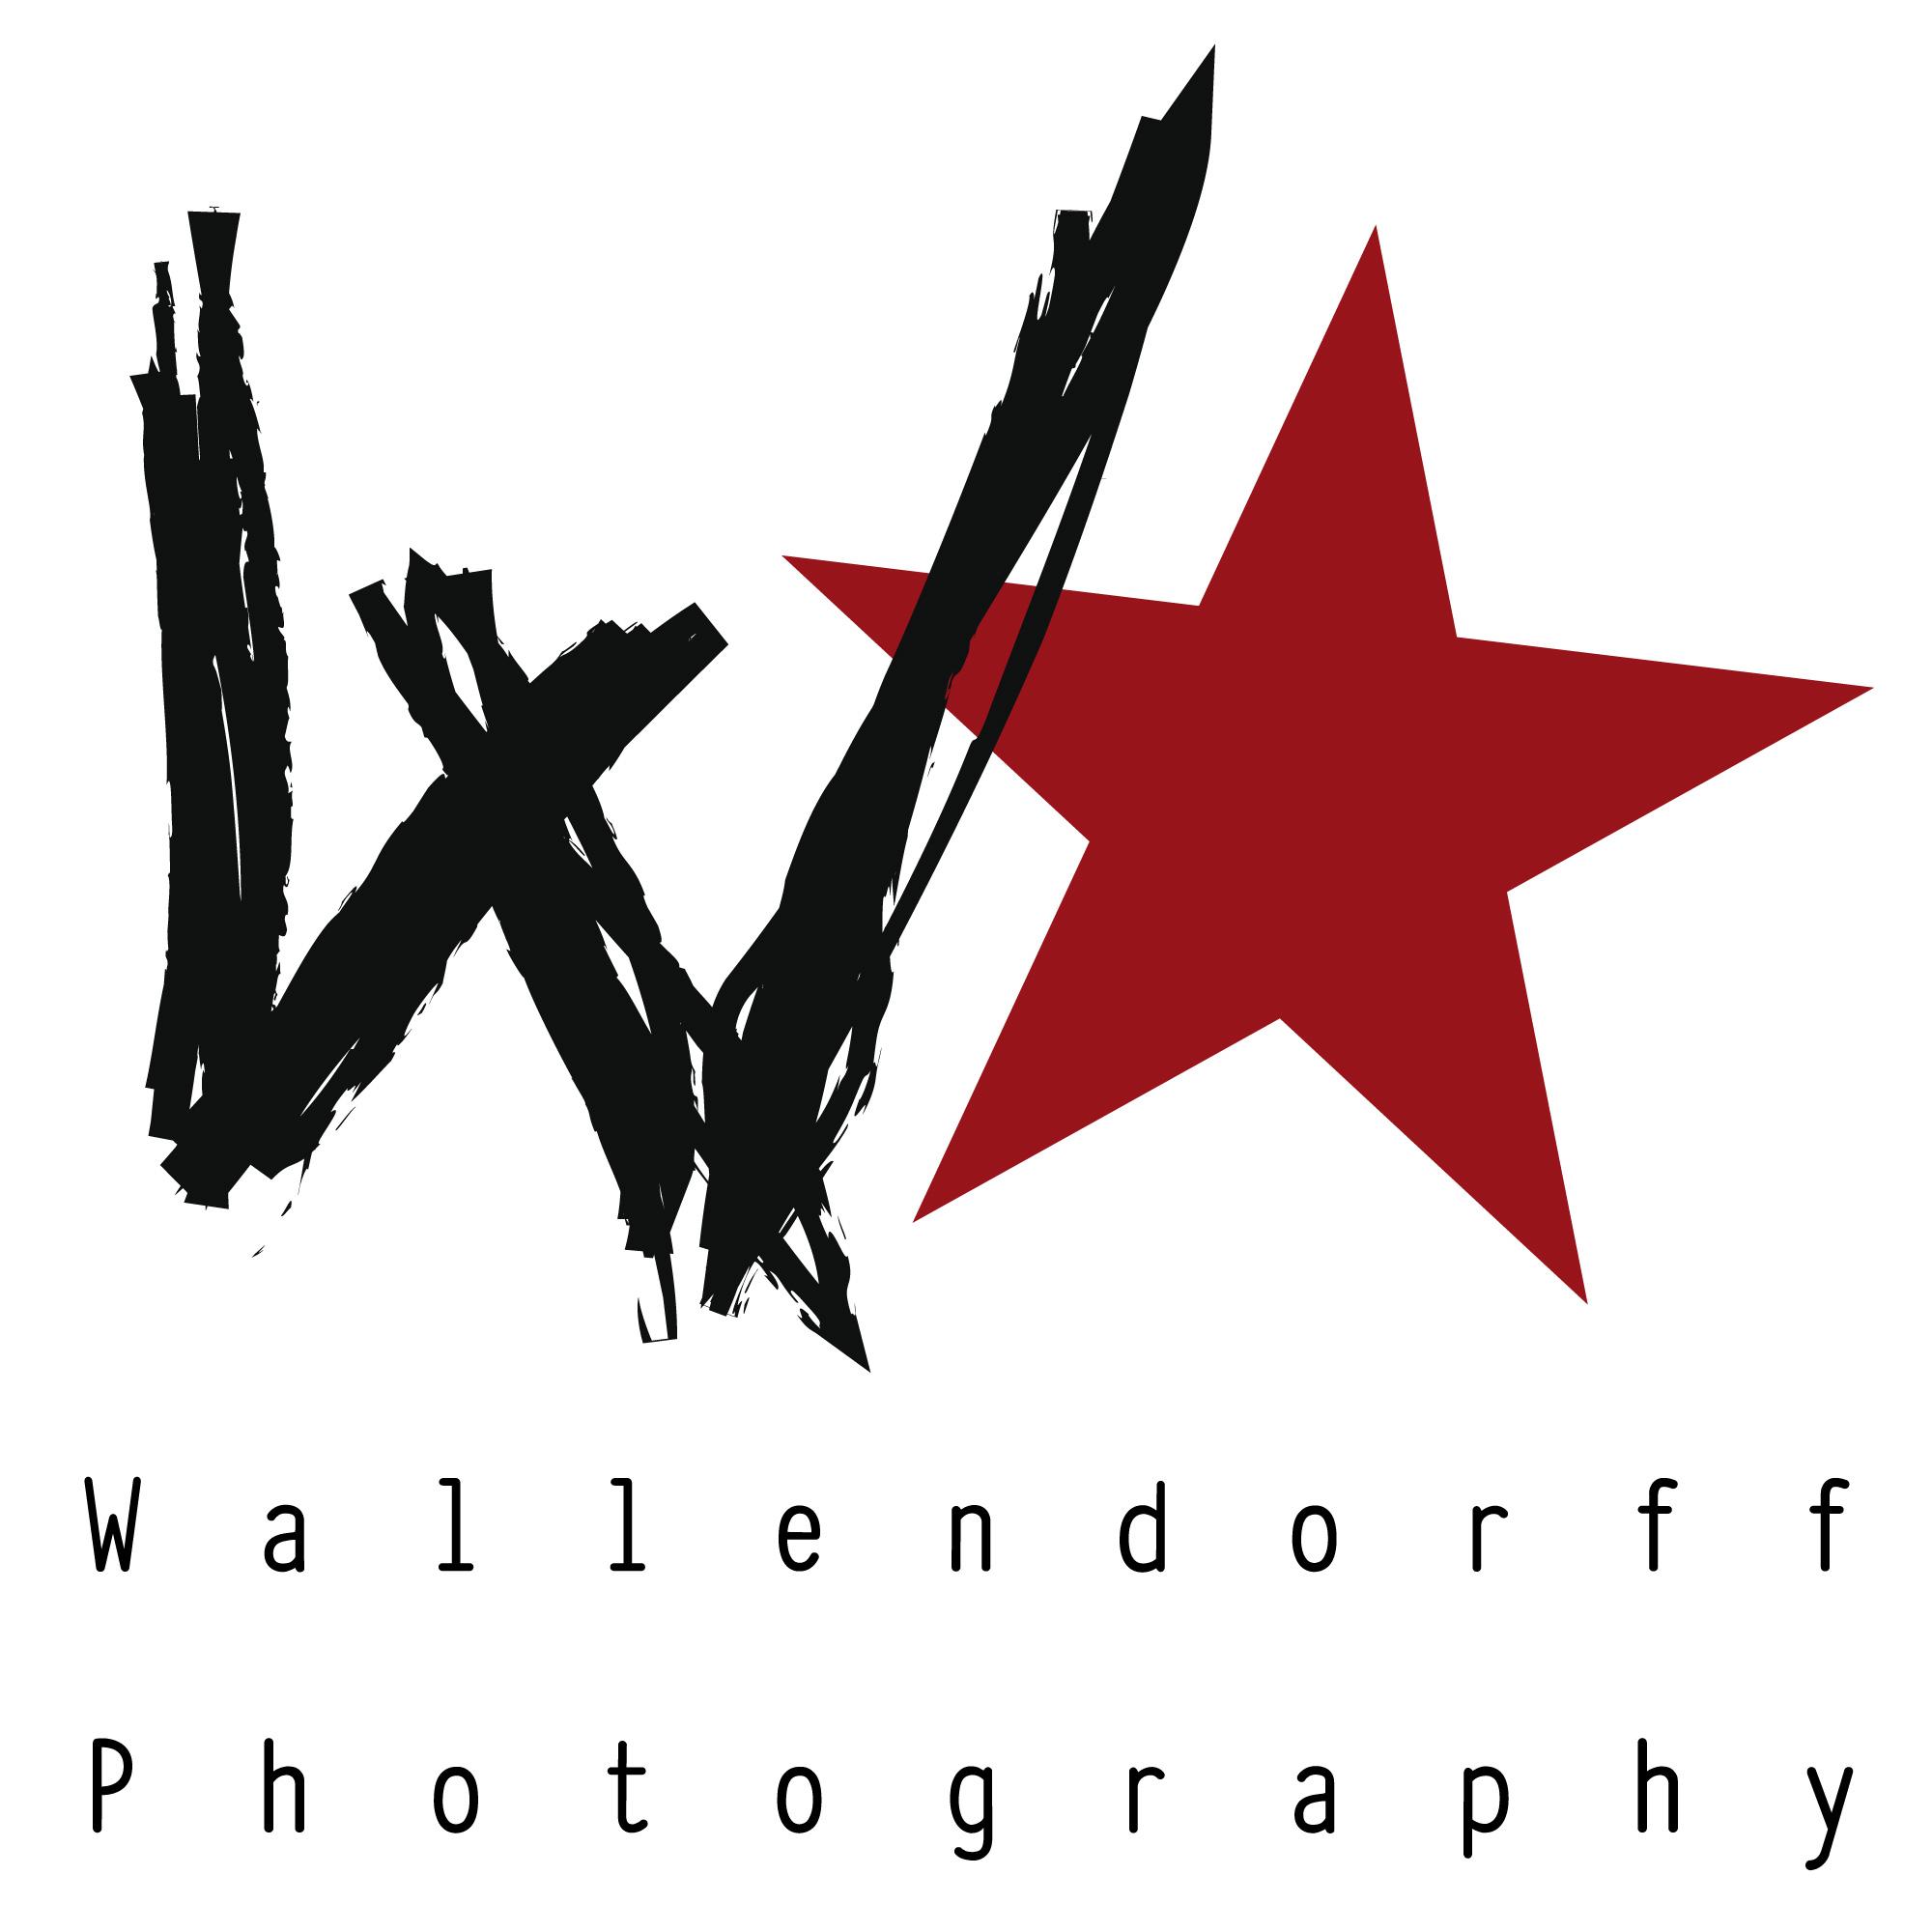 Wallendorff